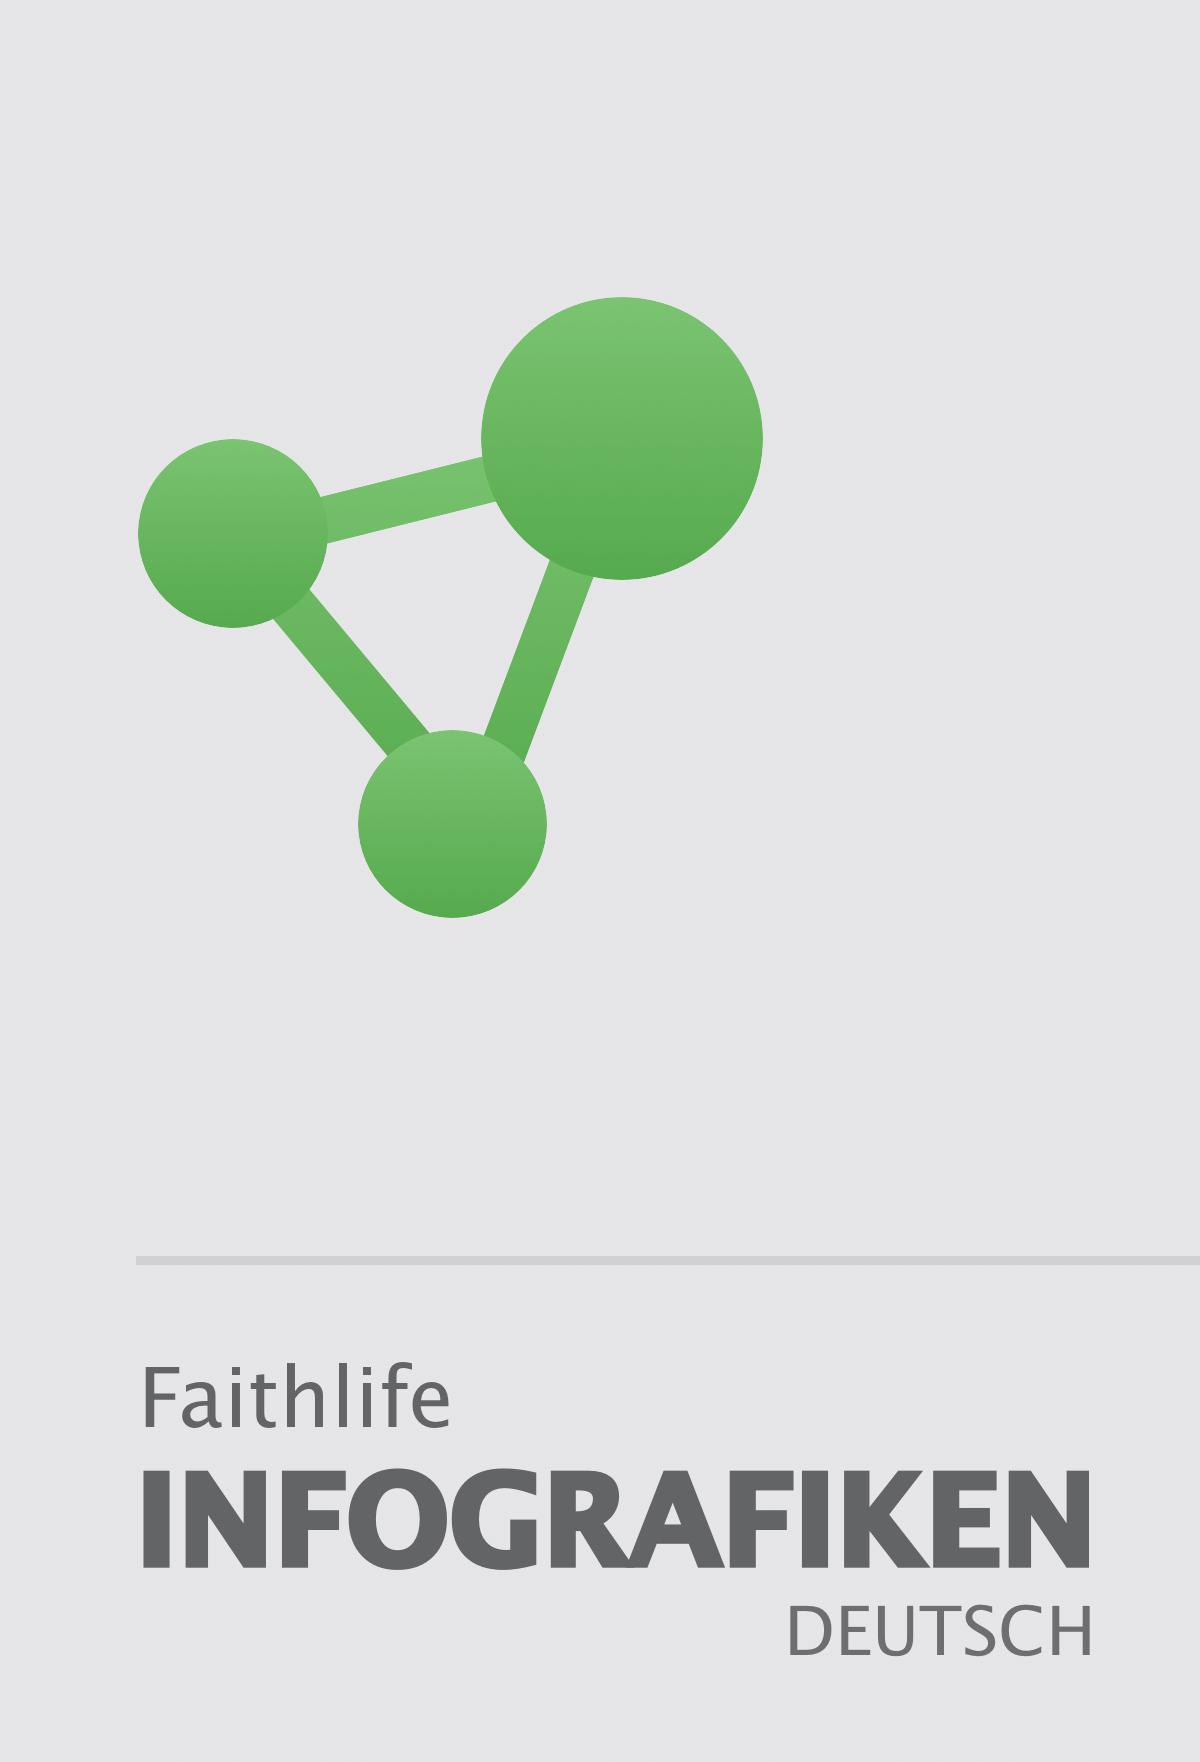 Logos Infografiken (aus der Faithlife Study Bible)